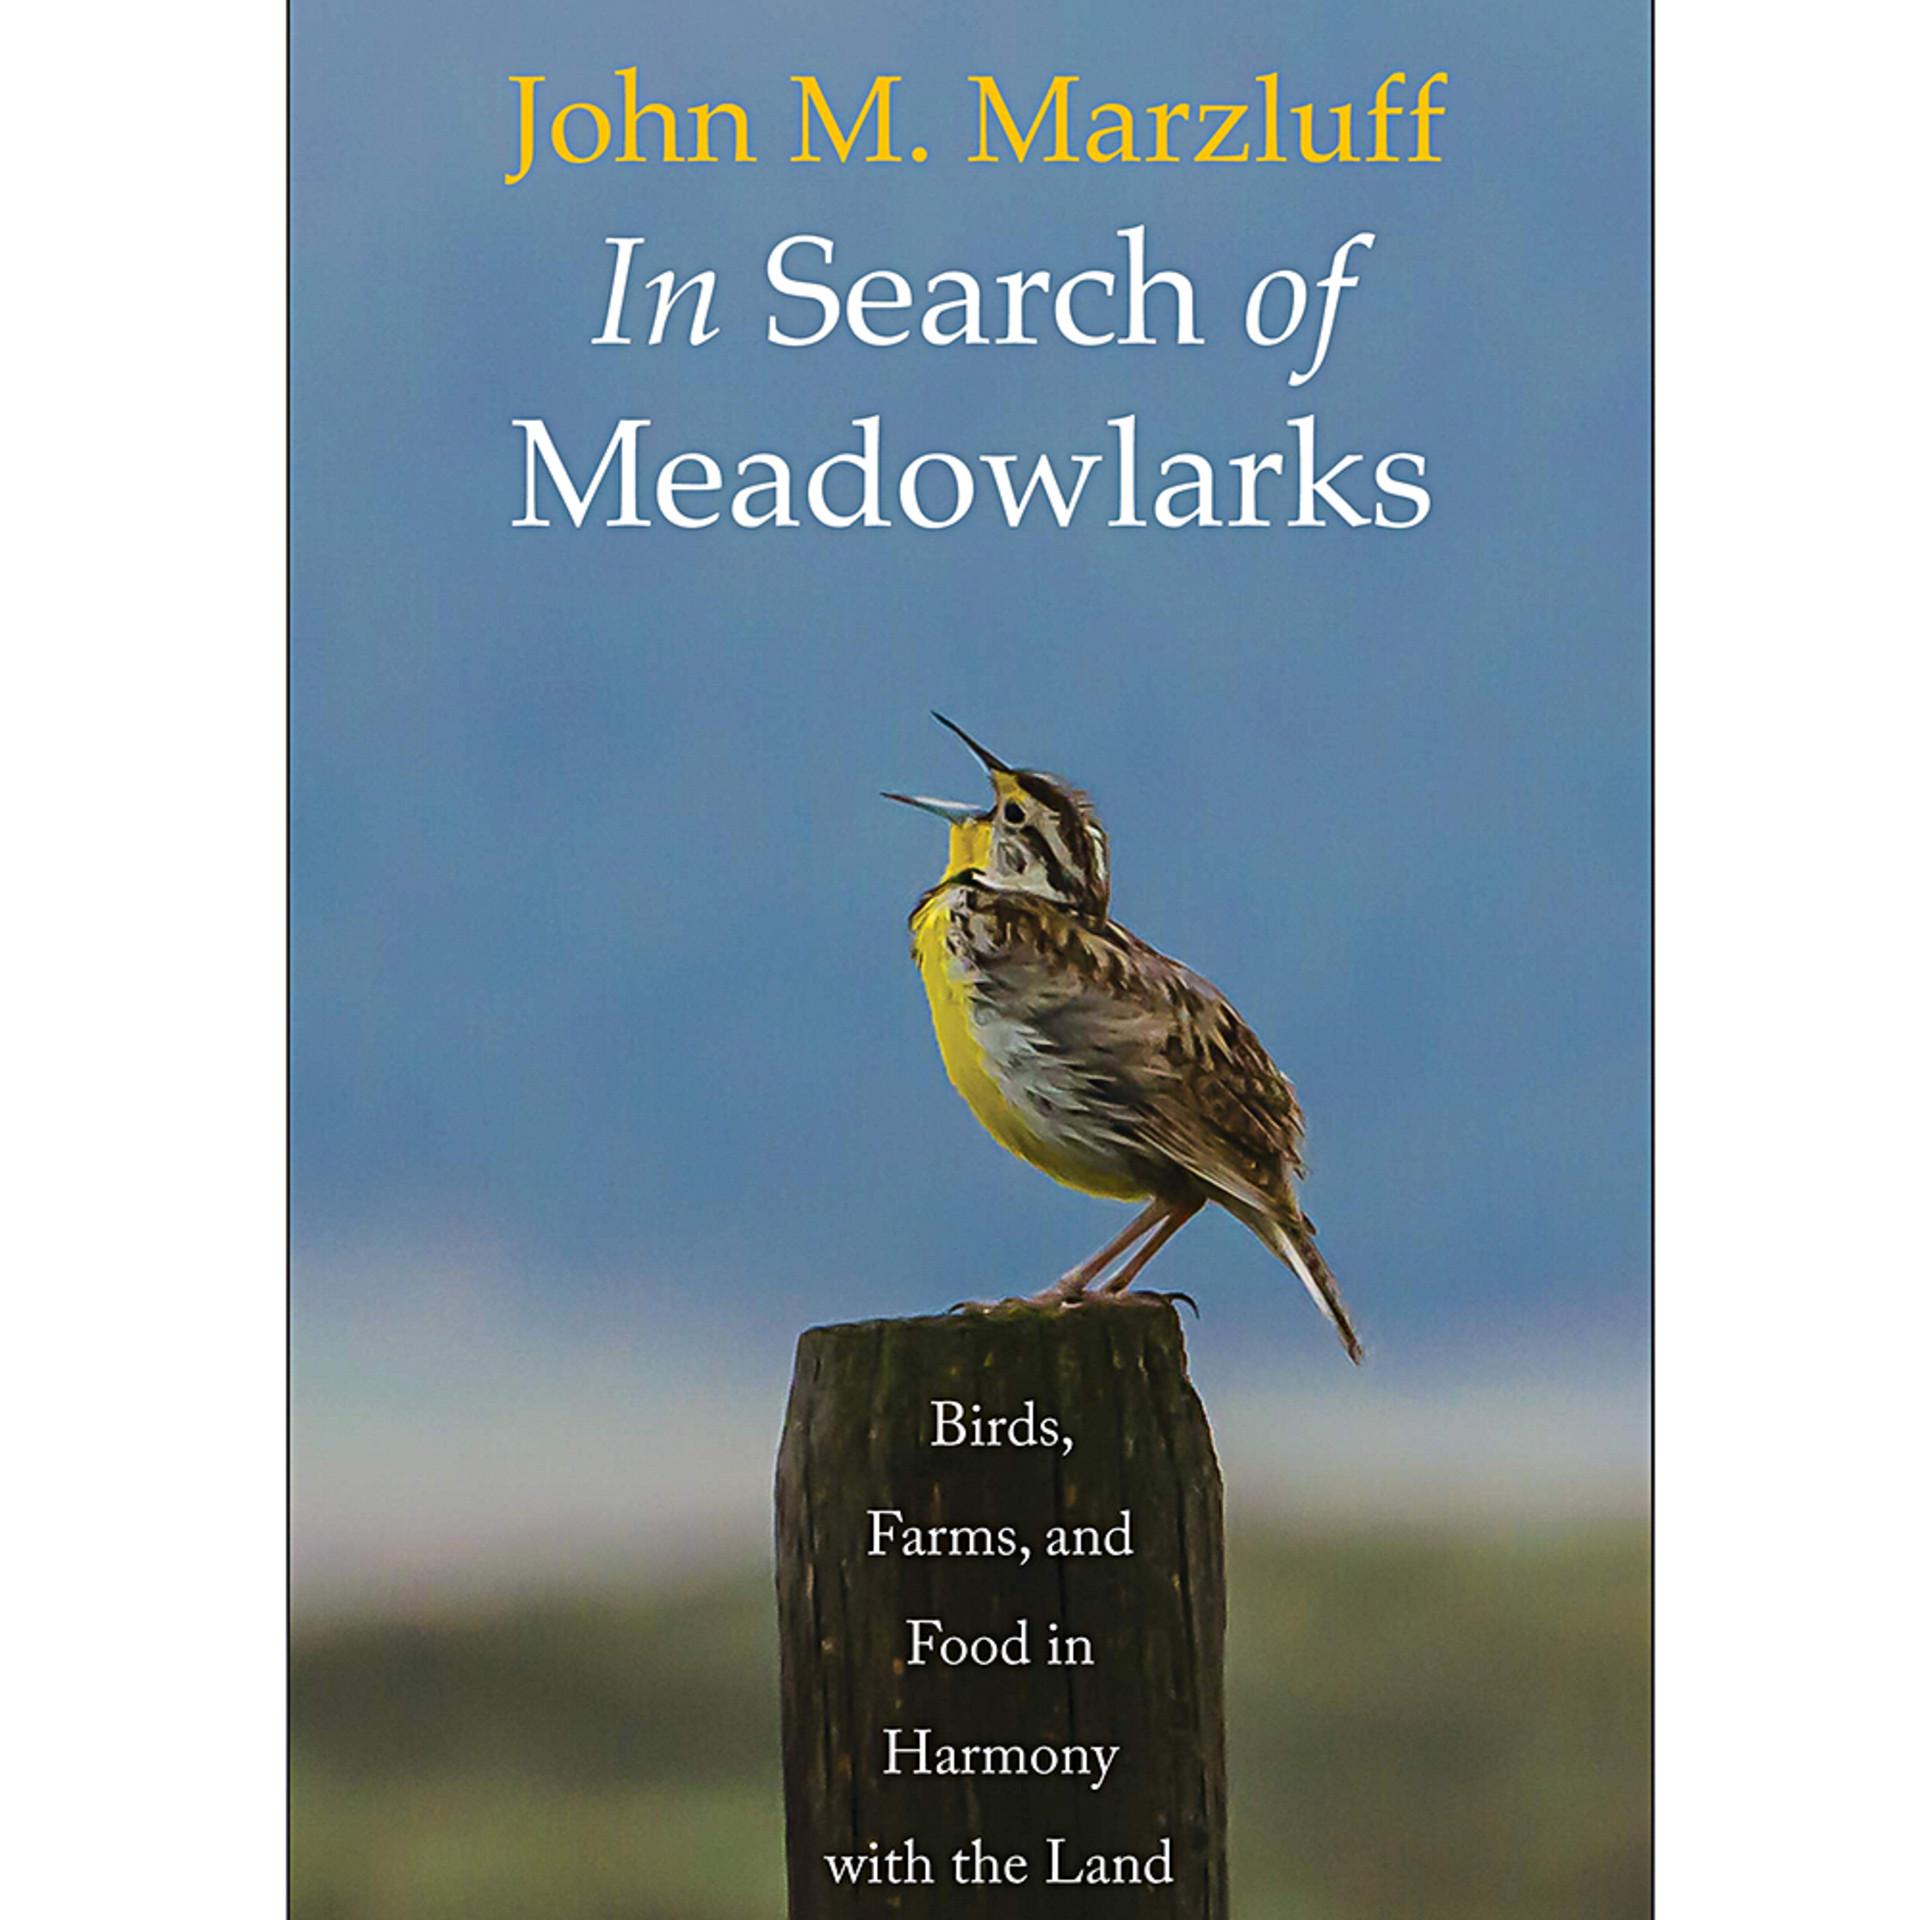 In Search of Meadowlarks by John M. Marzluff